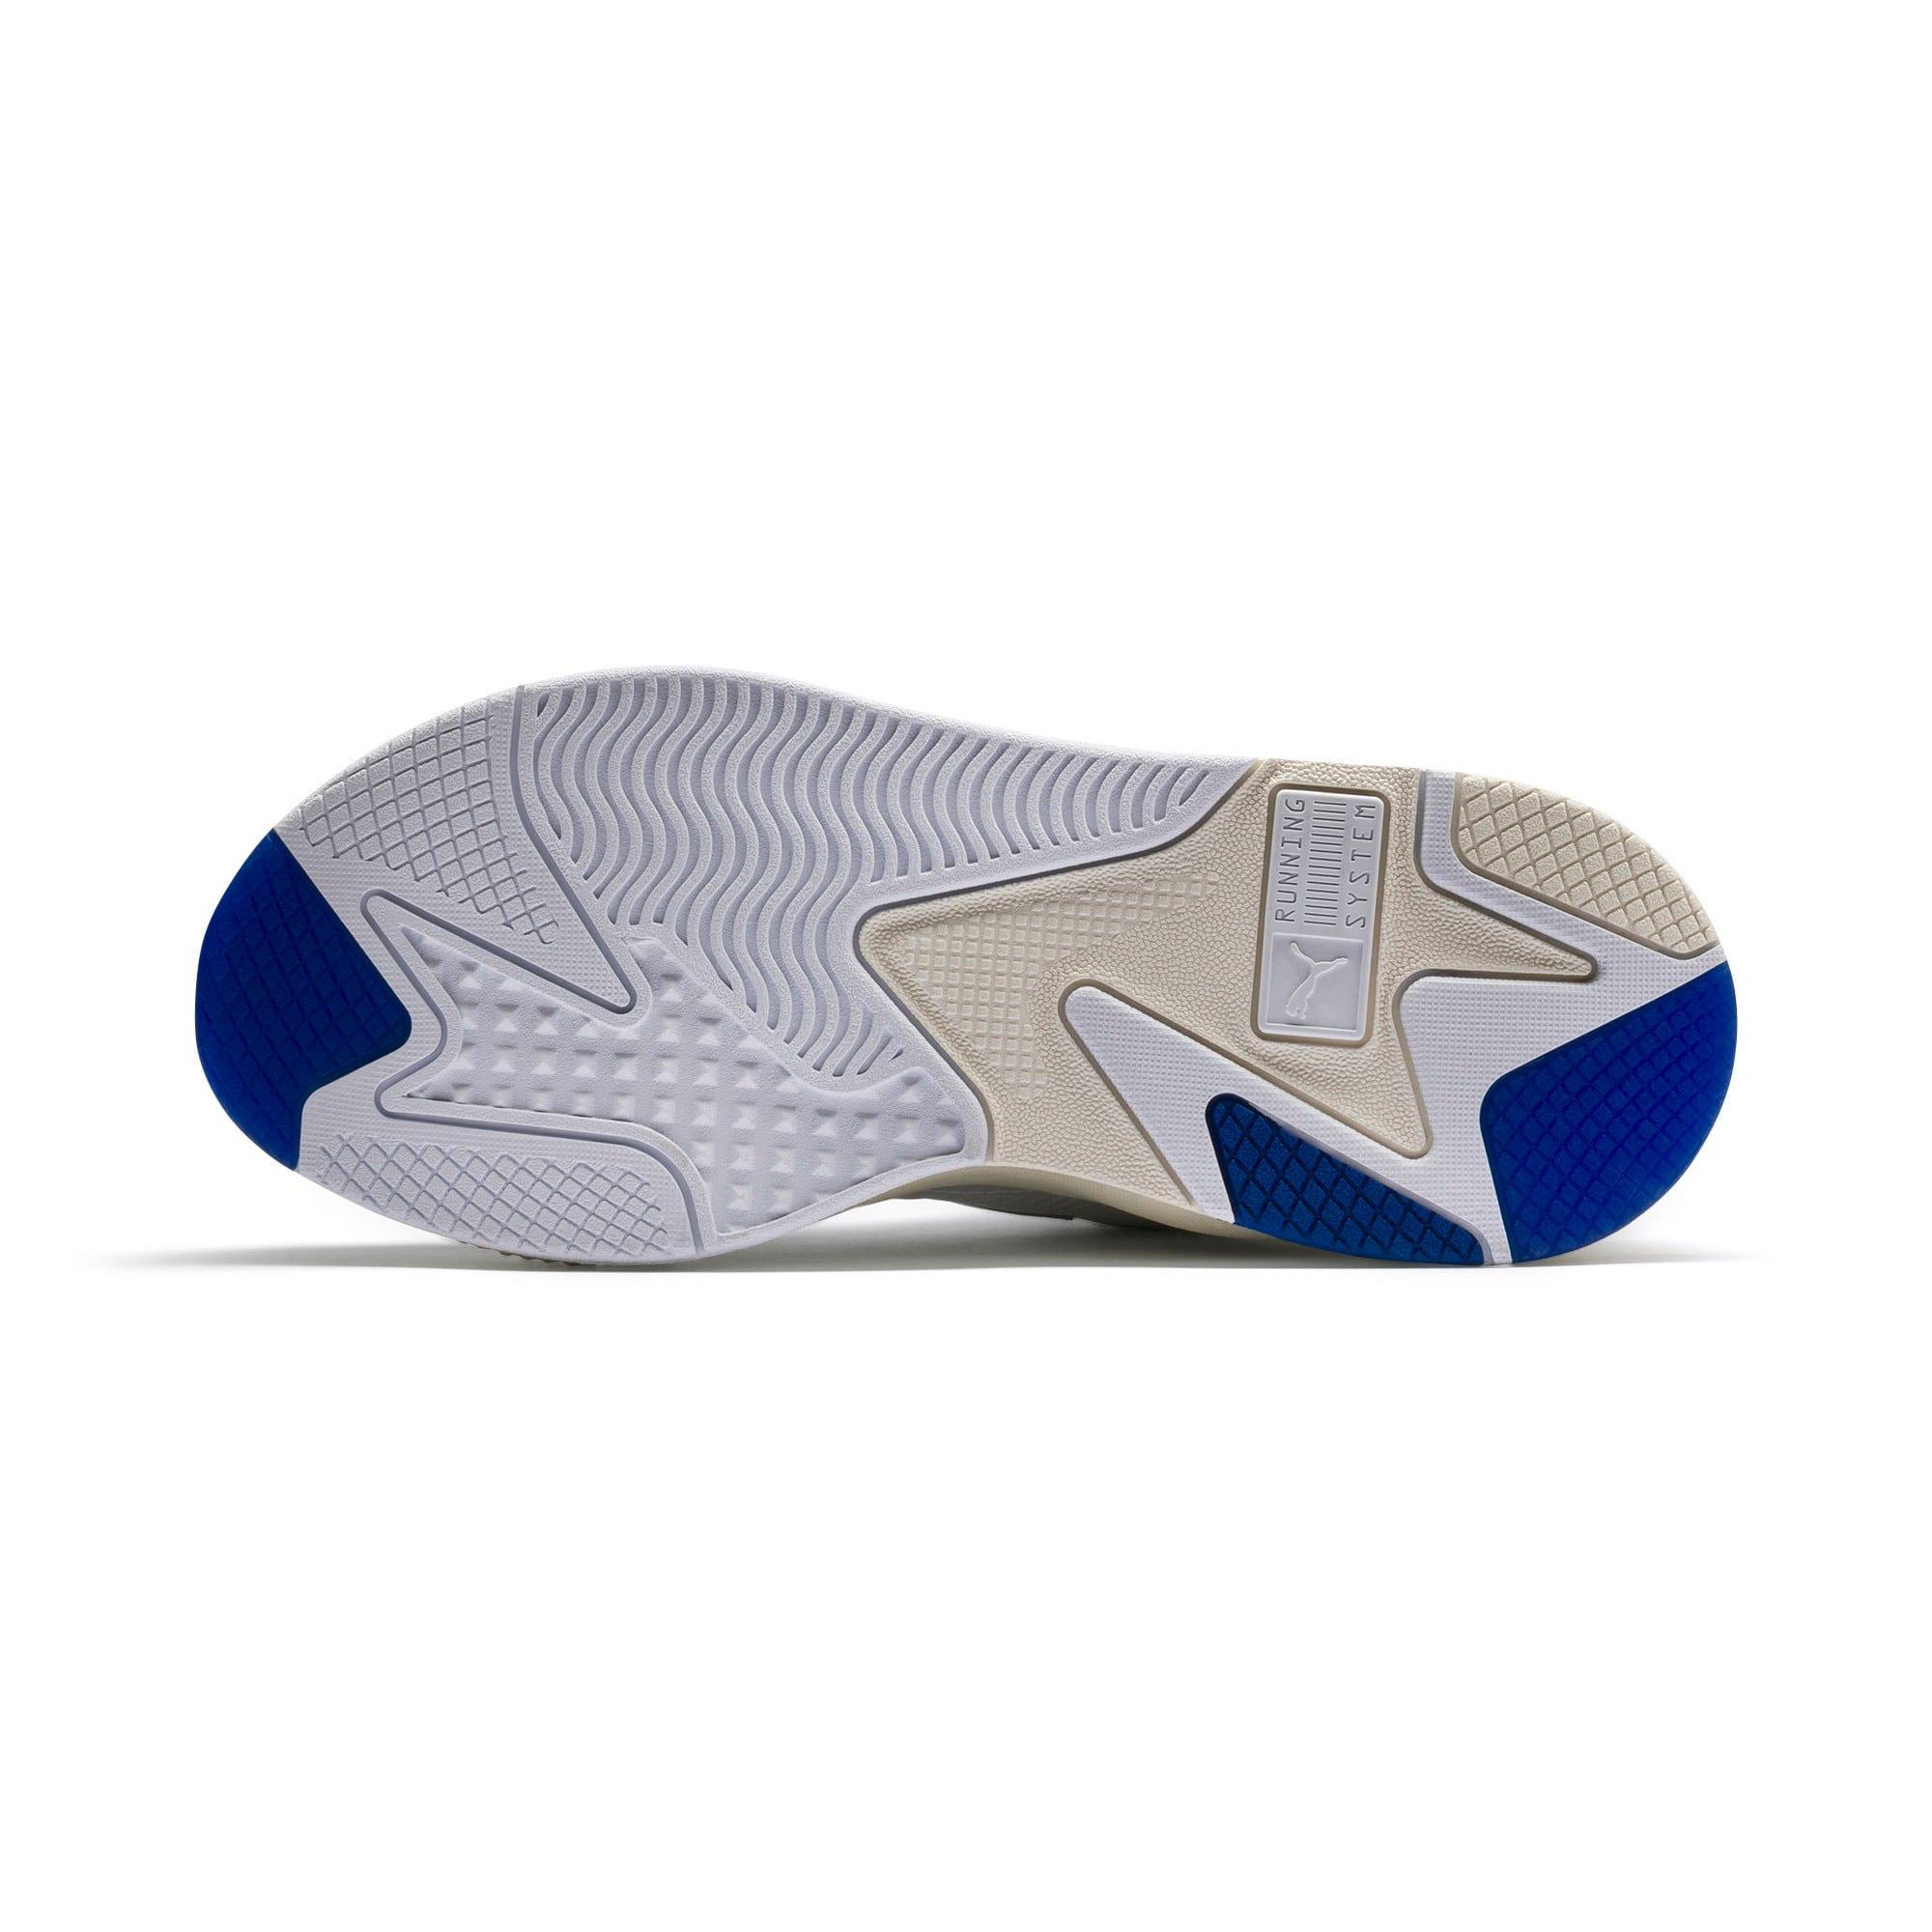 Thumbnail 5 of RS-X Tech Sneaker, Puma White-Whisper White, medium